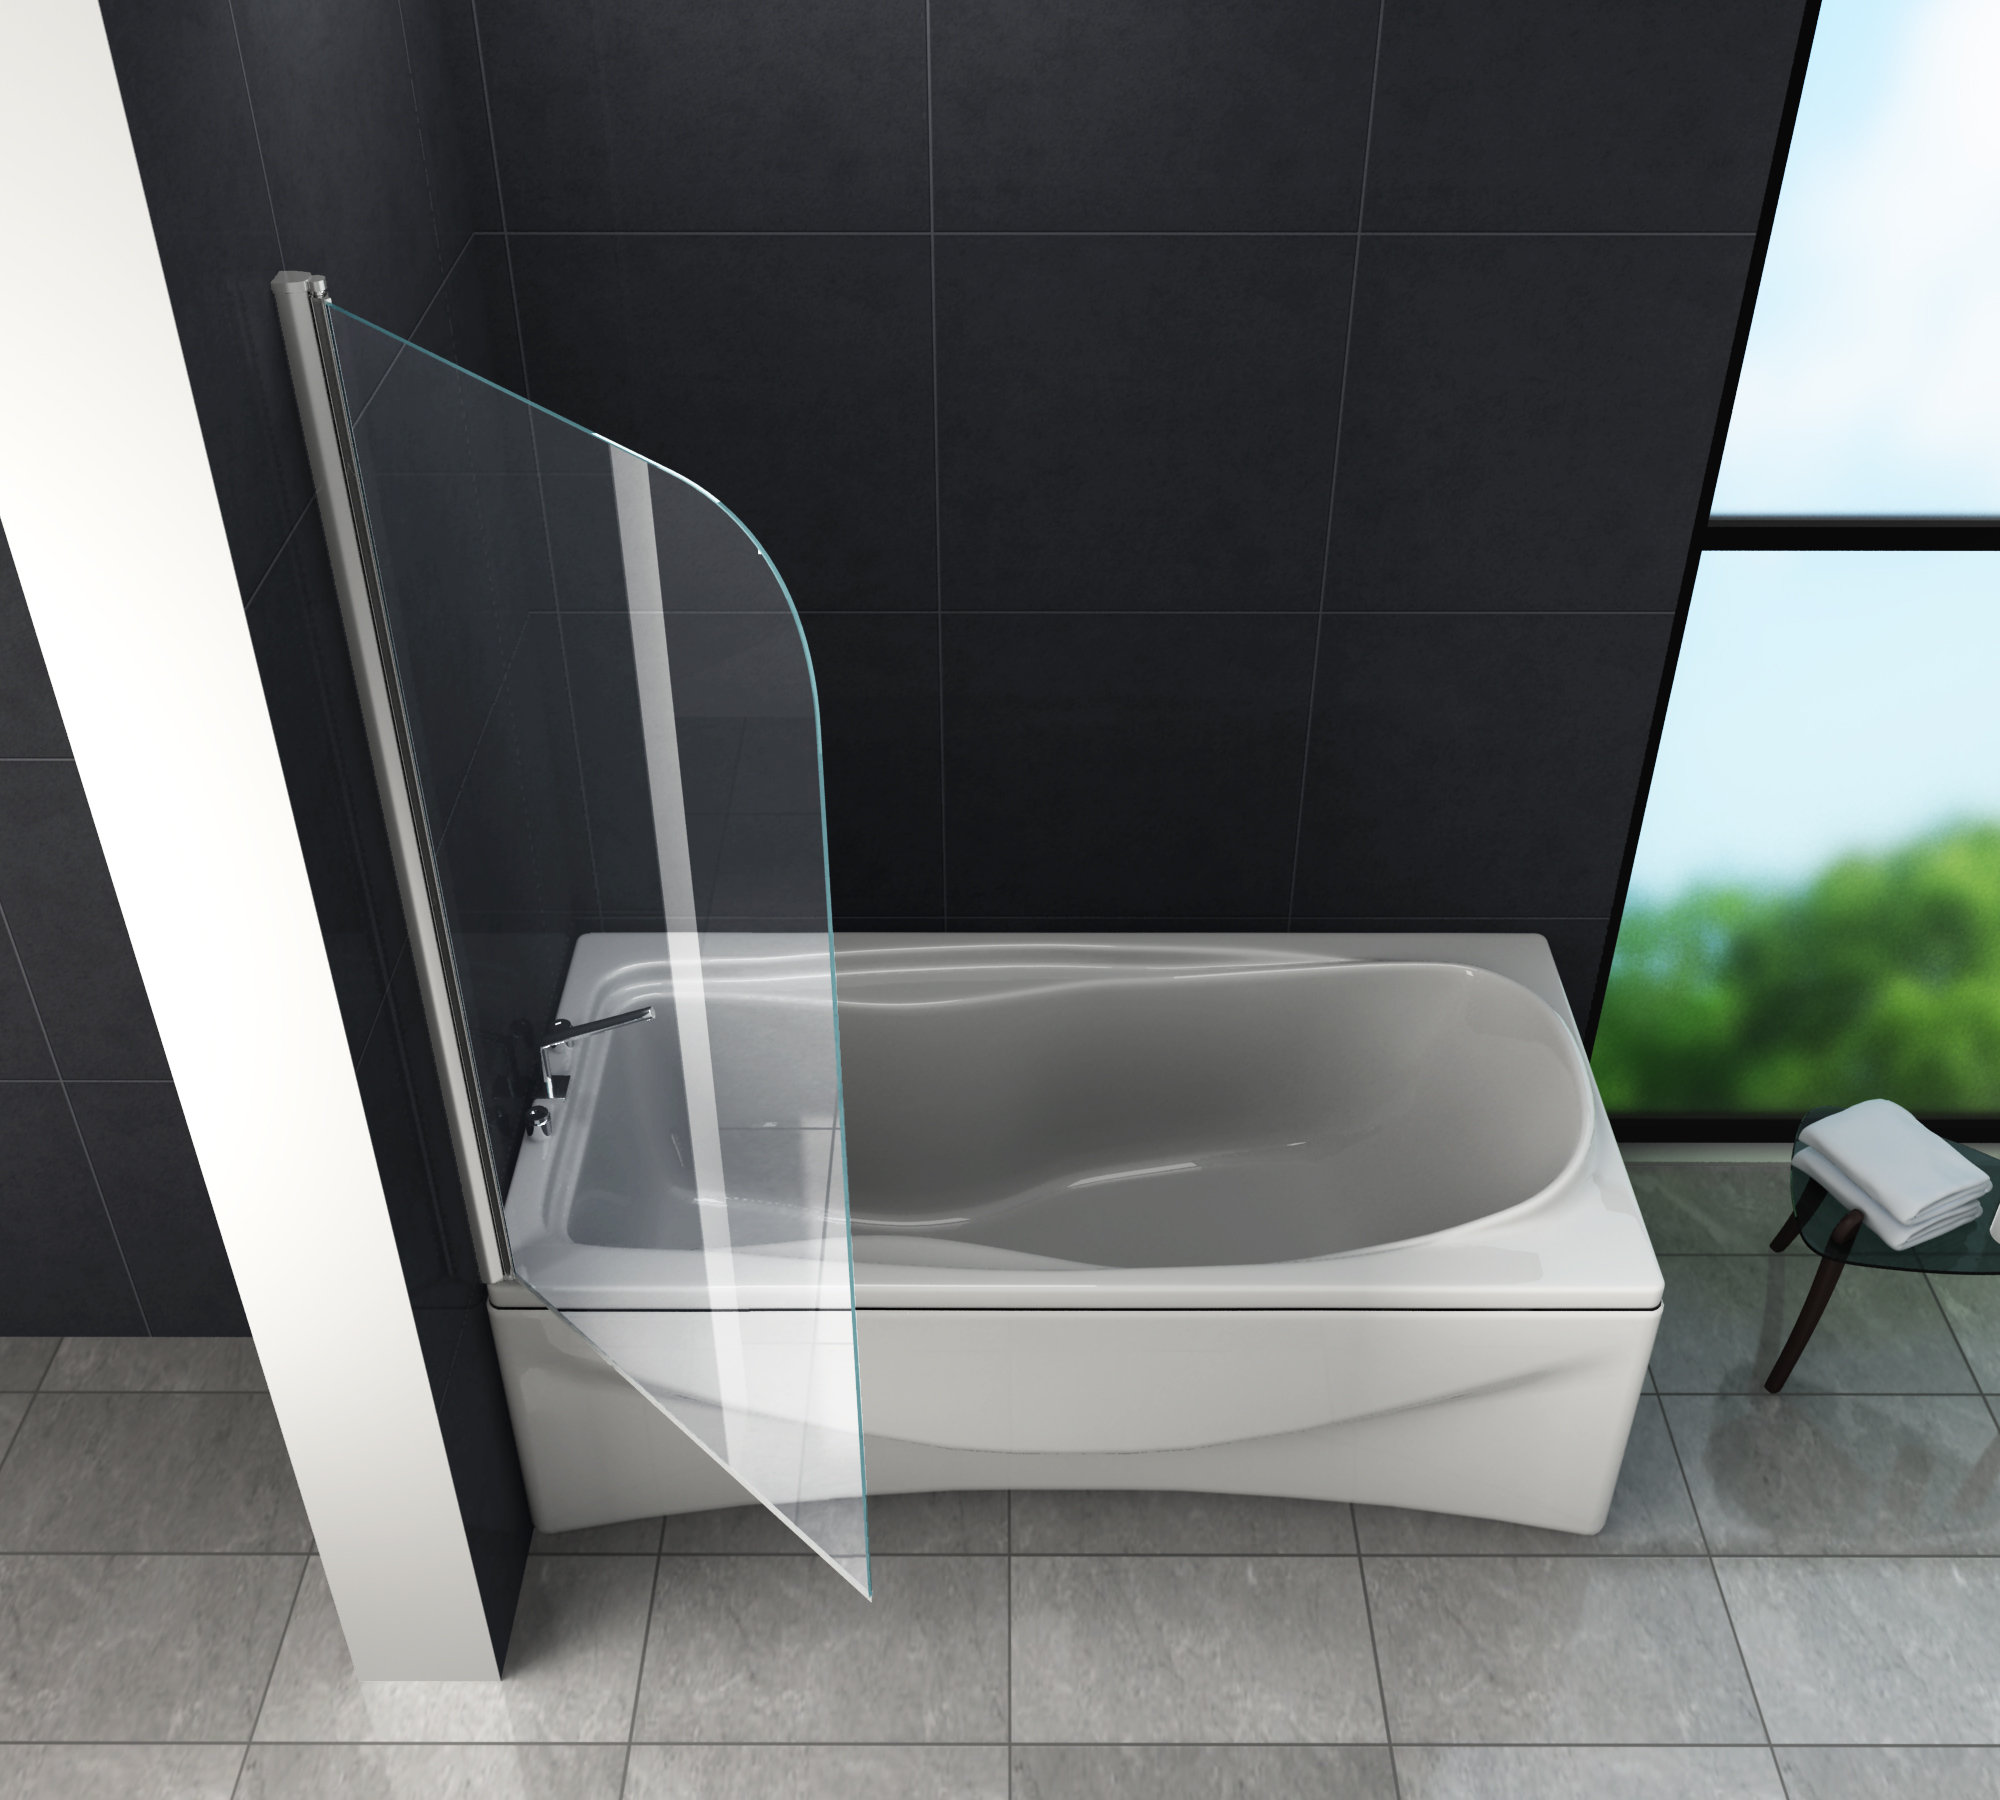 Duschtrennwand wellness 80 x 140 badewanne glasdeals - Badewanne duschtrennwand ...